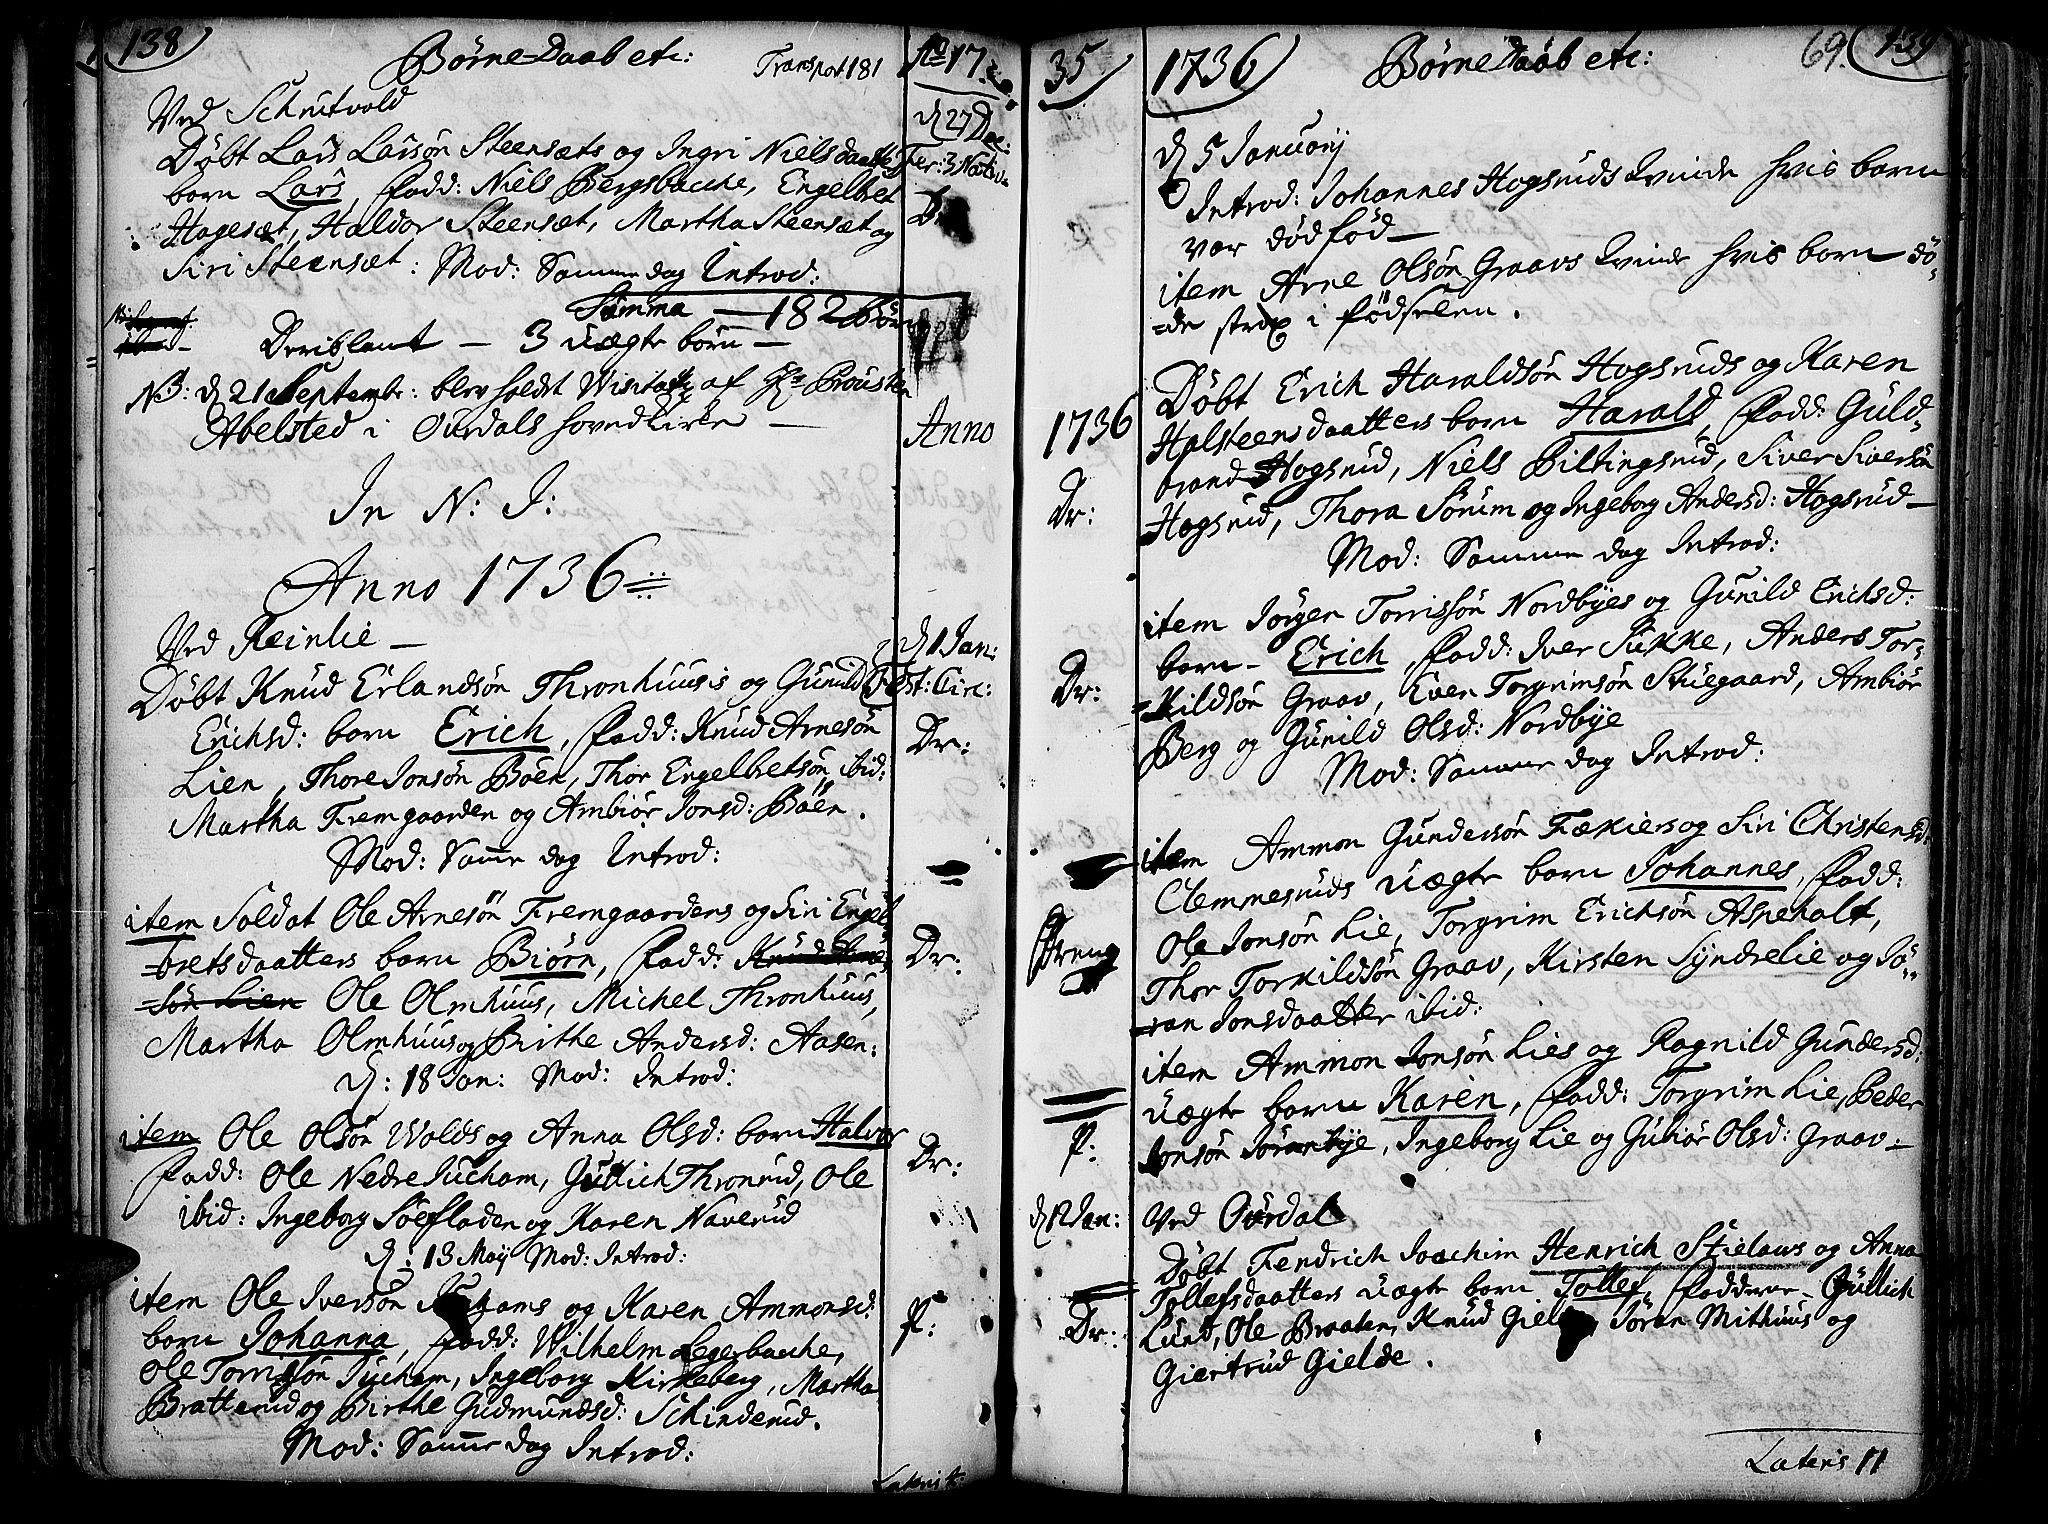 SAH, Aurdal prestekontor, Ministerialbok nr. 4, 1730-1762, s. 138-139